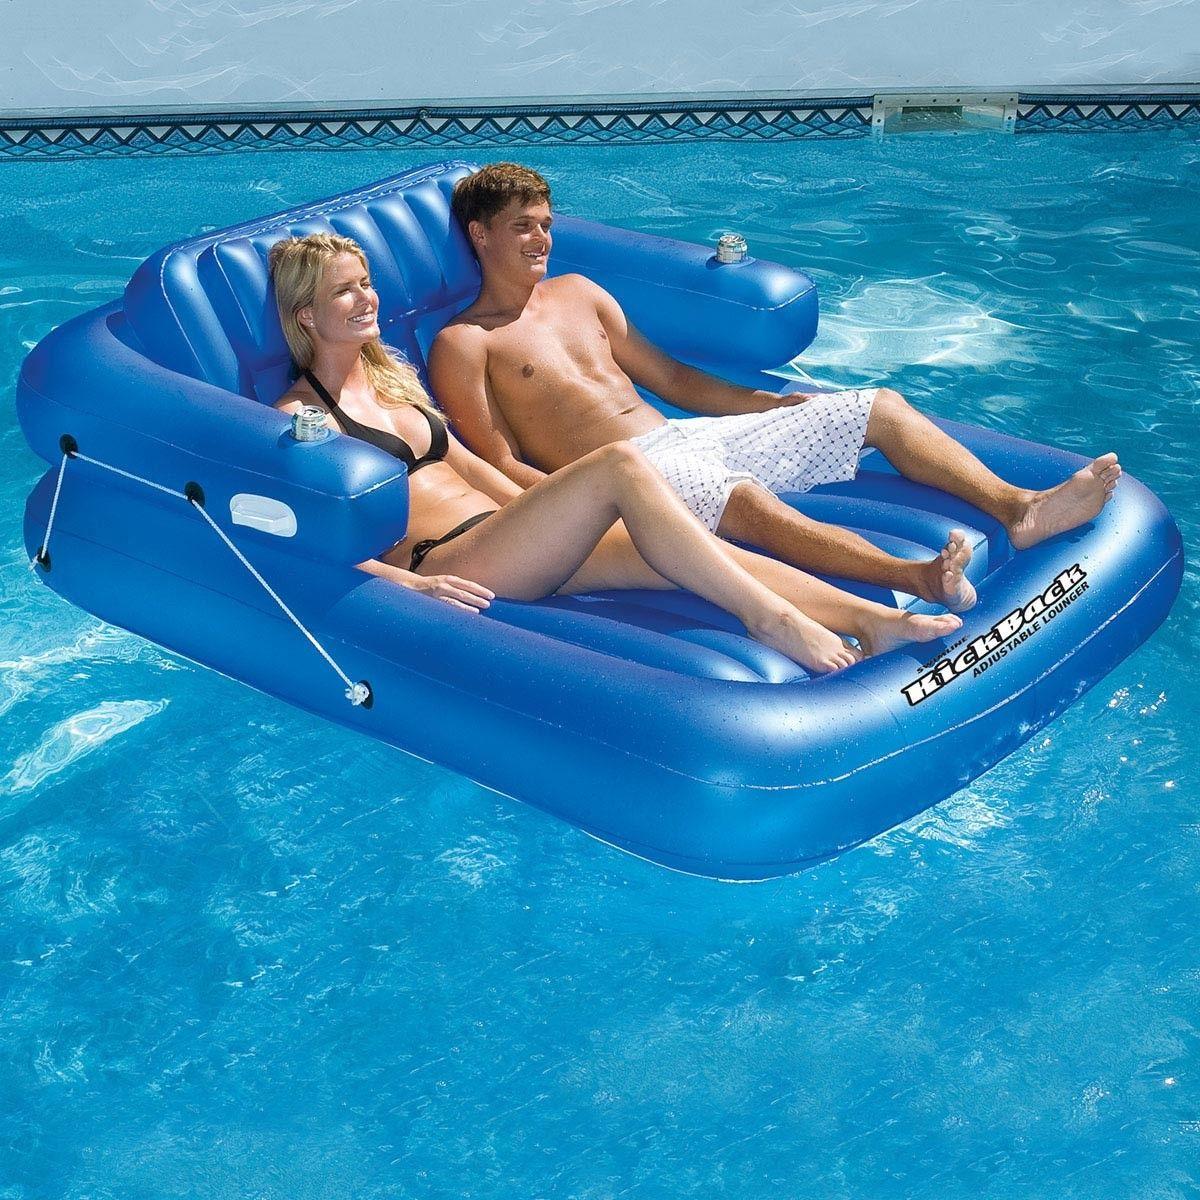 Swimline Kickback Double Adjustable Lounger Swimming Pool Floats Pool Floats Pool Lounger